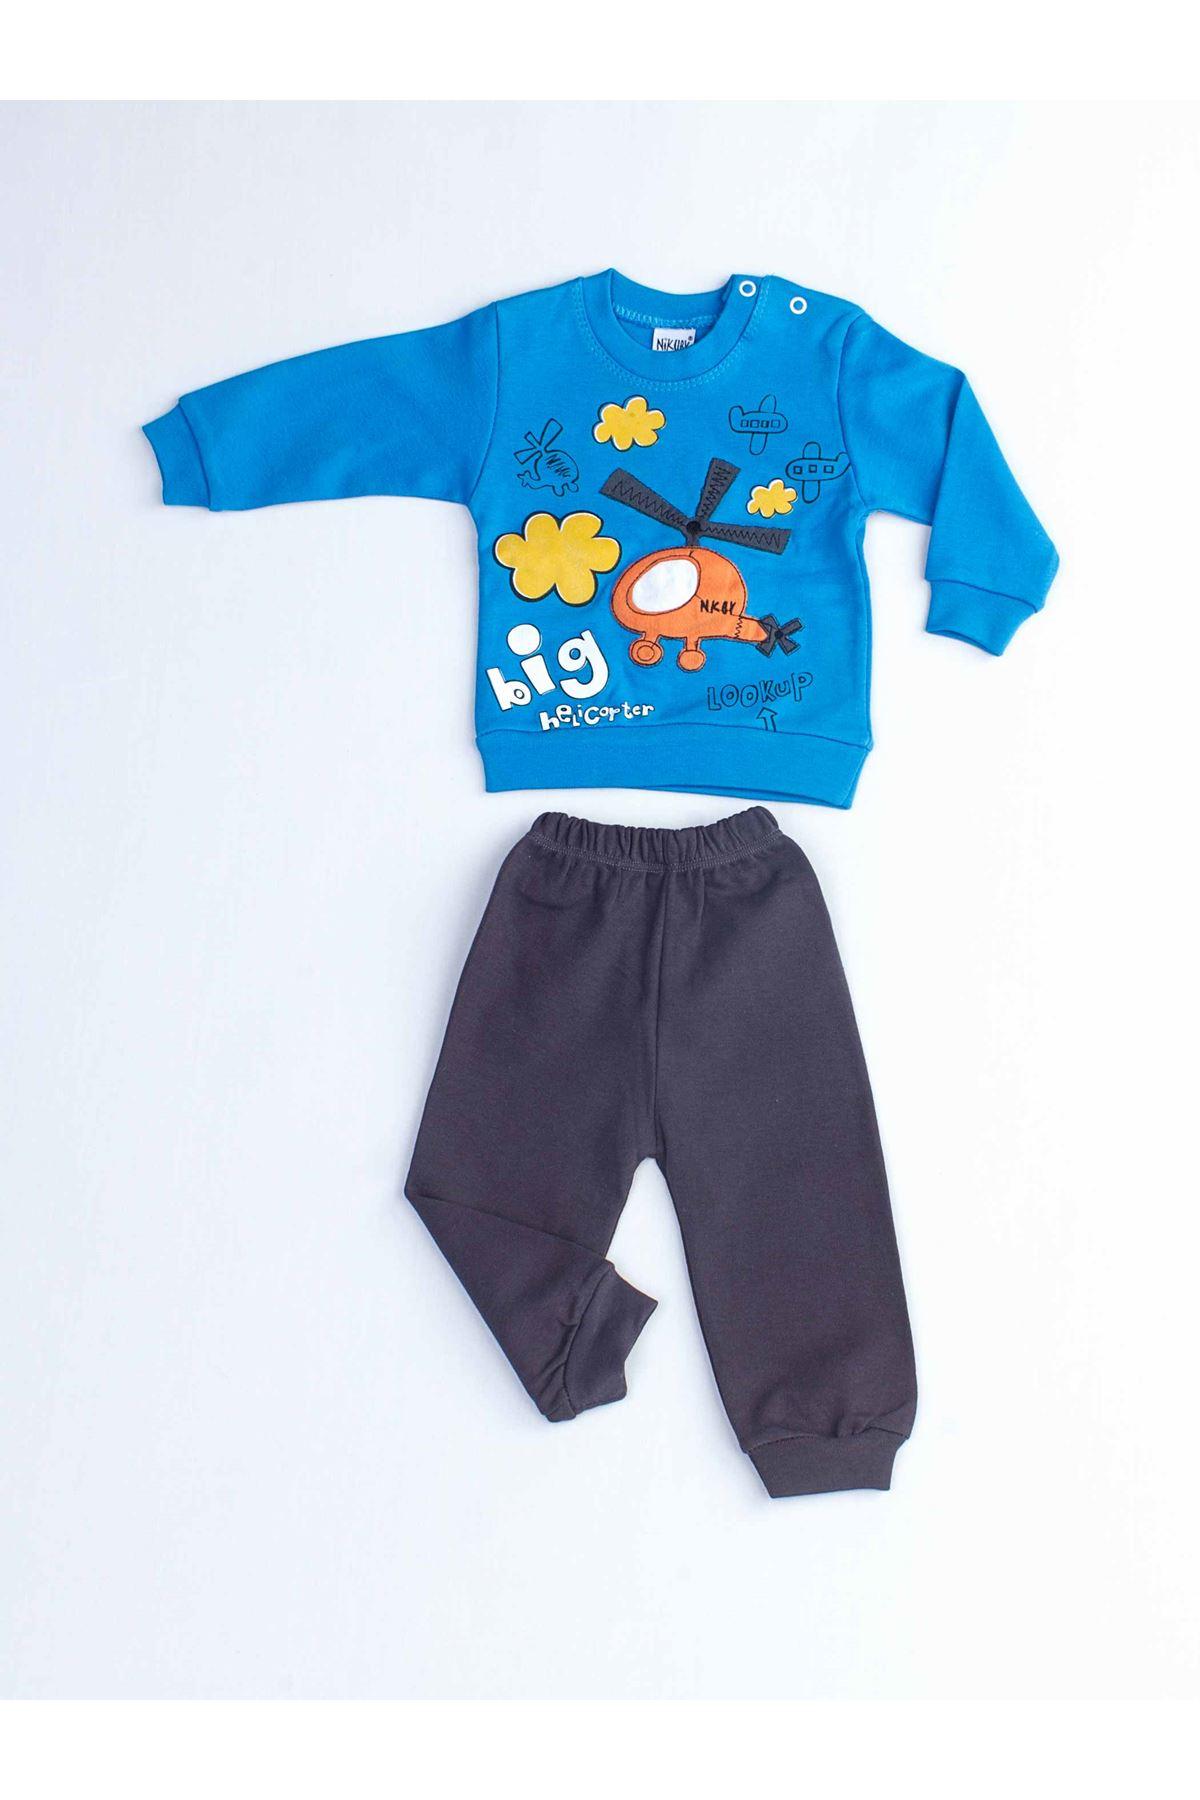 Sax Male Baby 2 Piece Suit